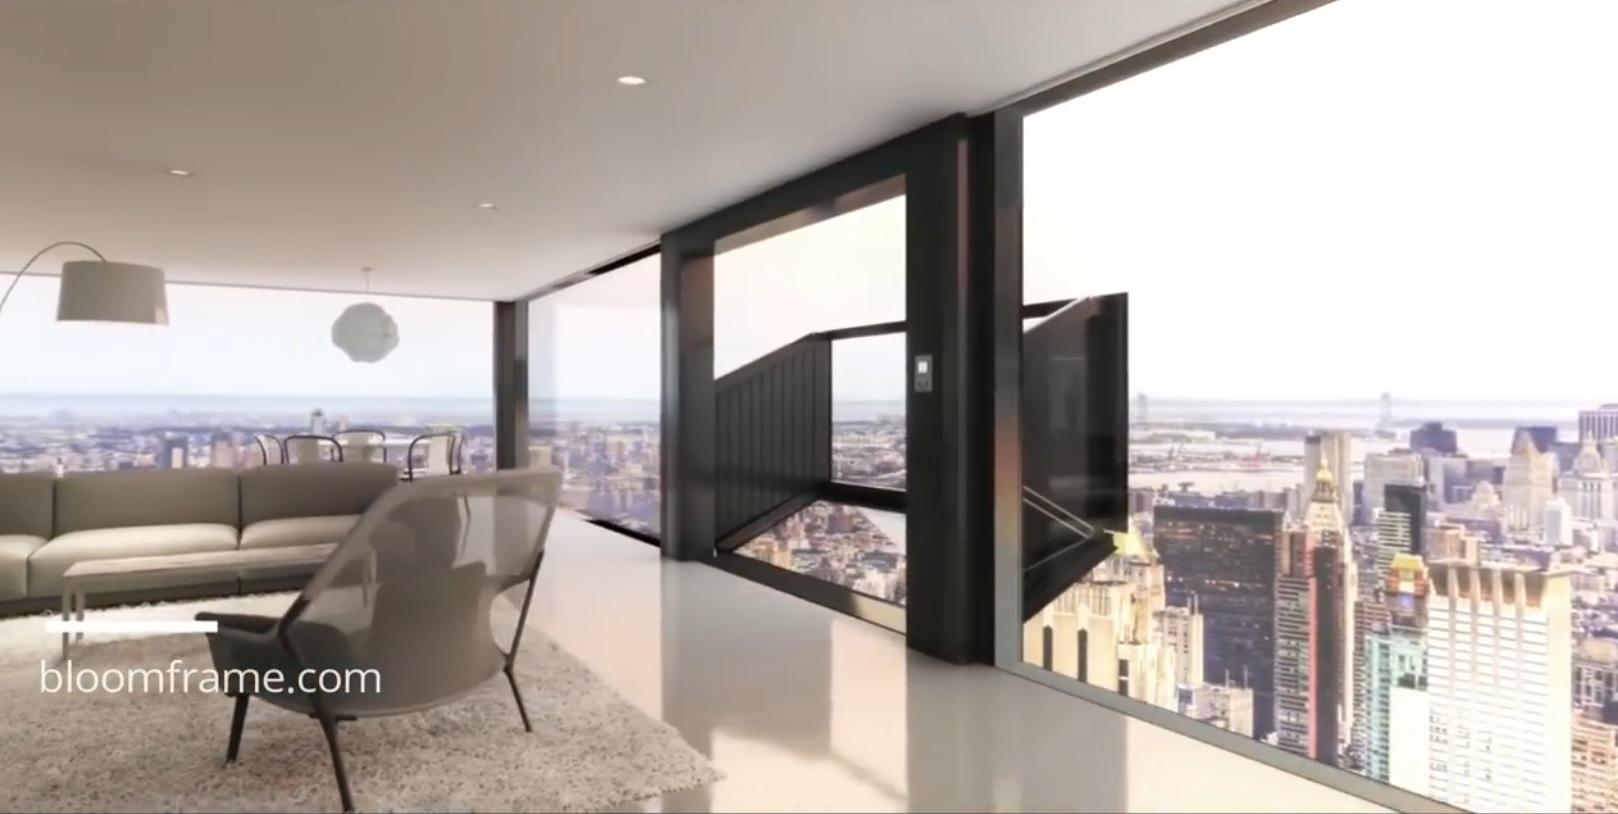 Balkona Dönüşen Pencere | Gökdelende Pencereden Balkon